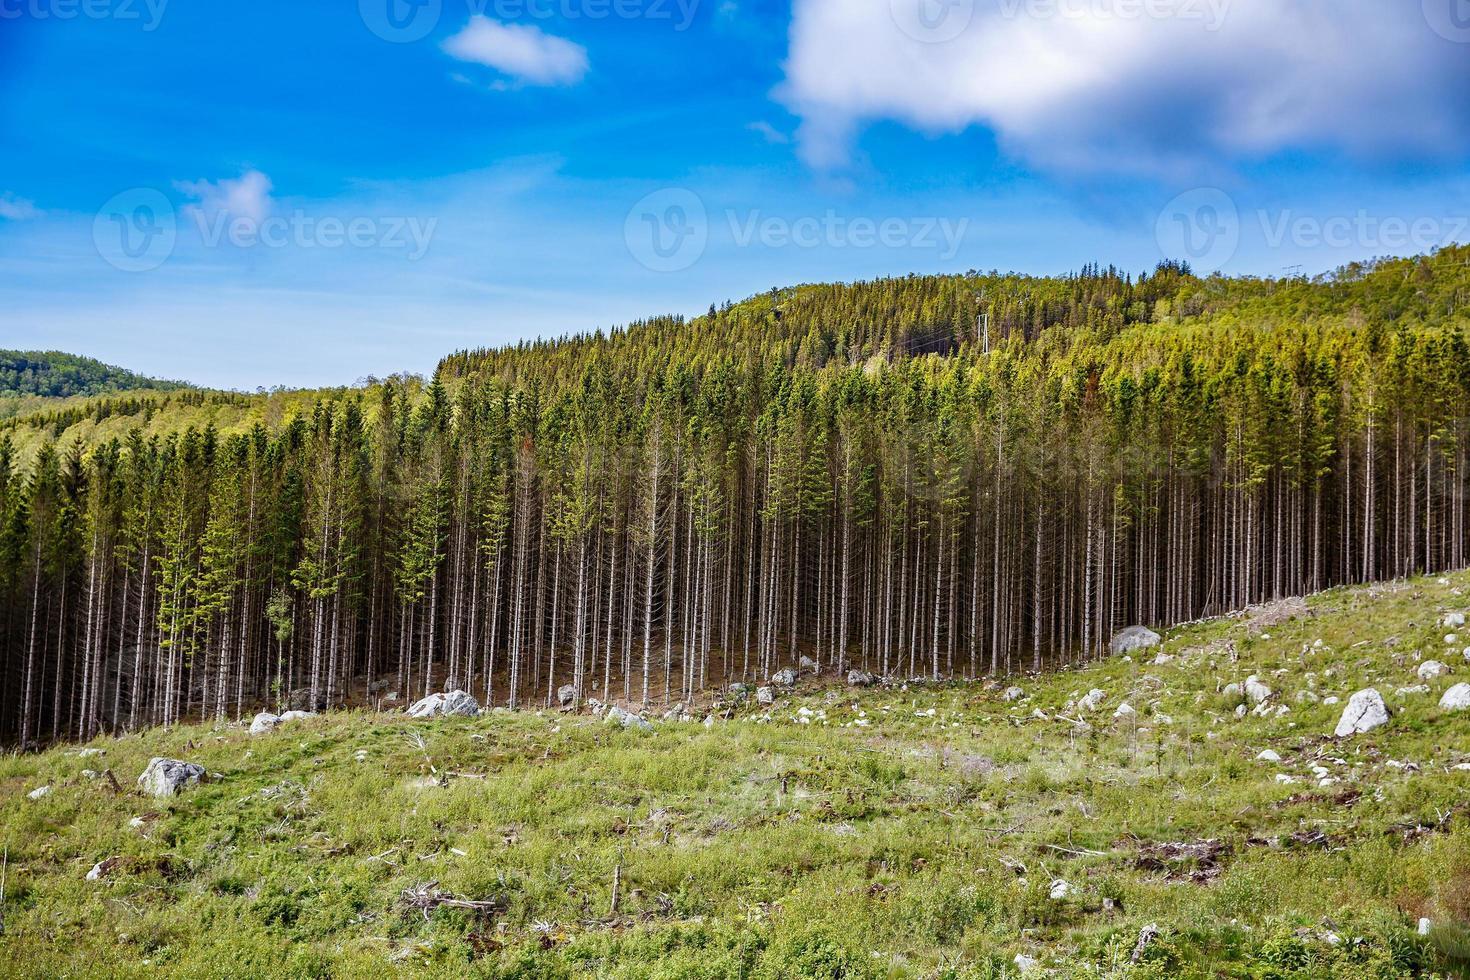 deforestazione in Norvegia foto